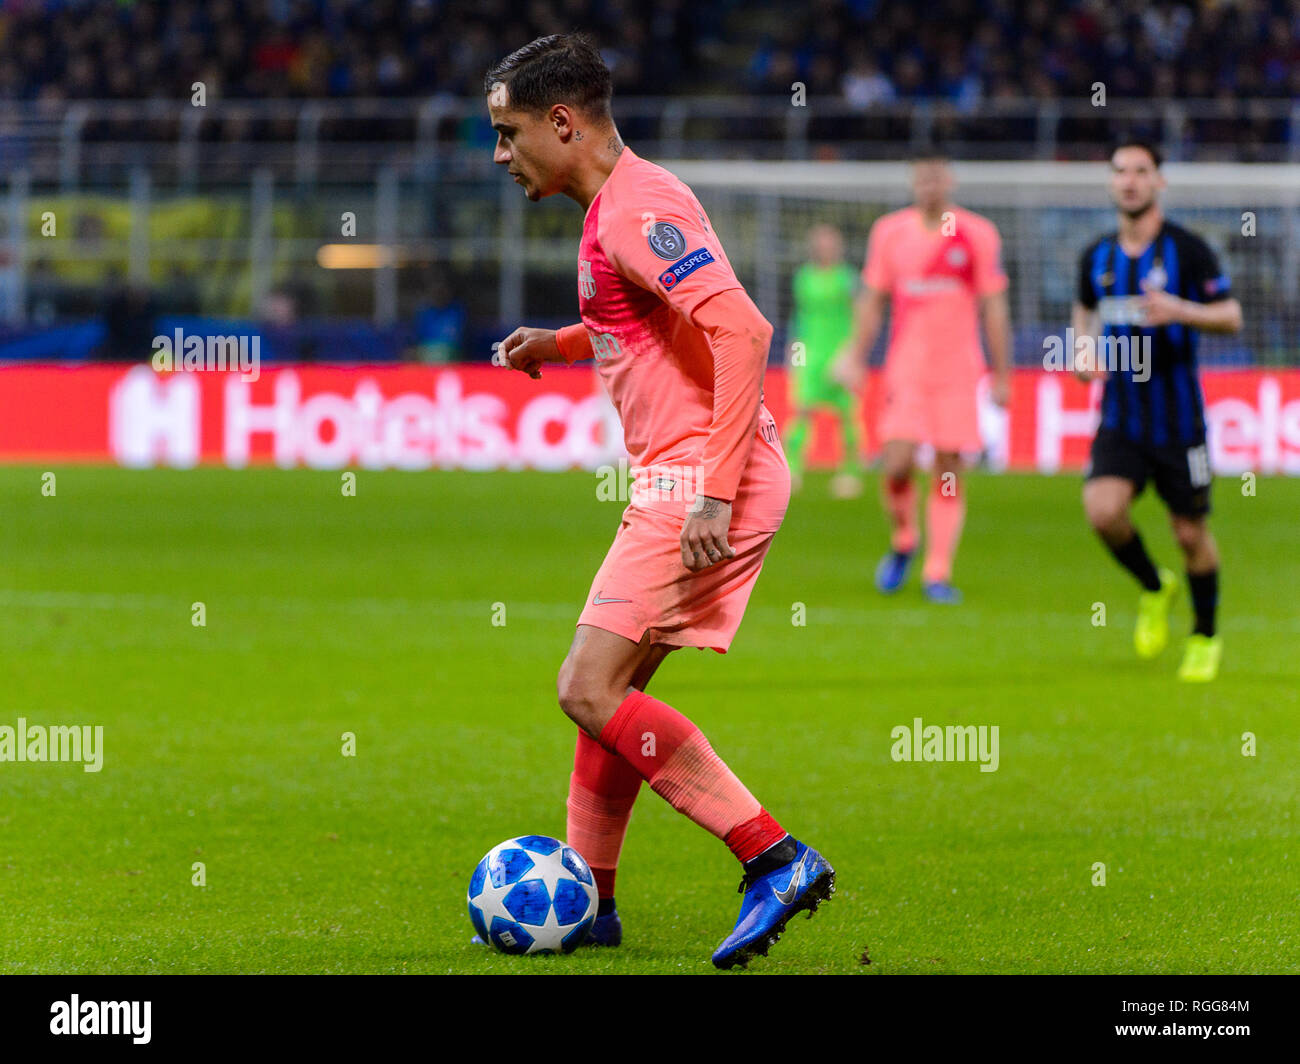 Milan - Nov 6, 2018: Philippe Coutinho 7 controls the ball. FC Internazionale - FC Barcelona. UEFA Champions League. Matchday 4. Giuseppe Meazza (San  Stock Photo